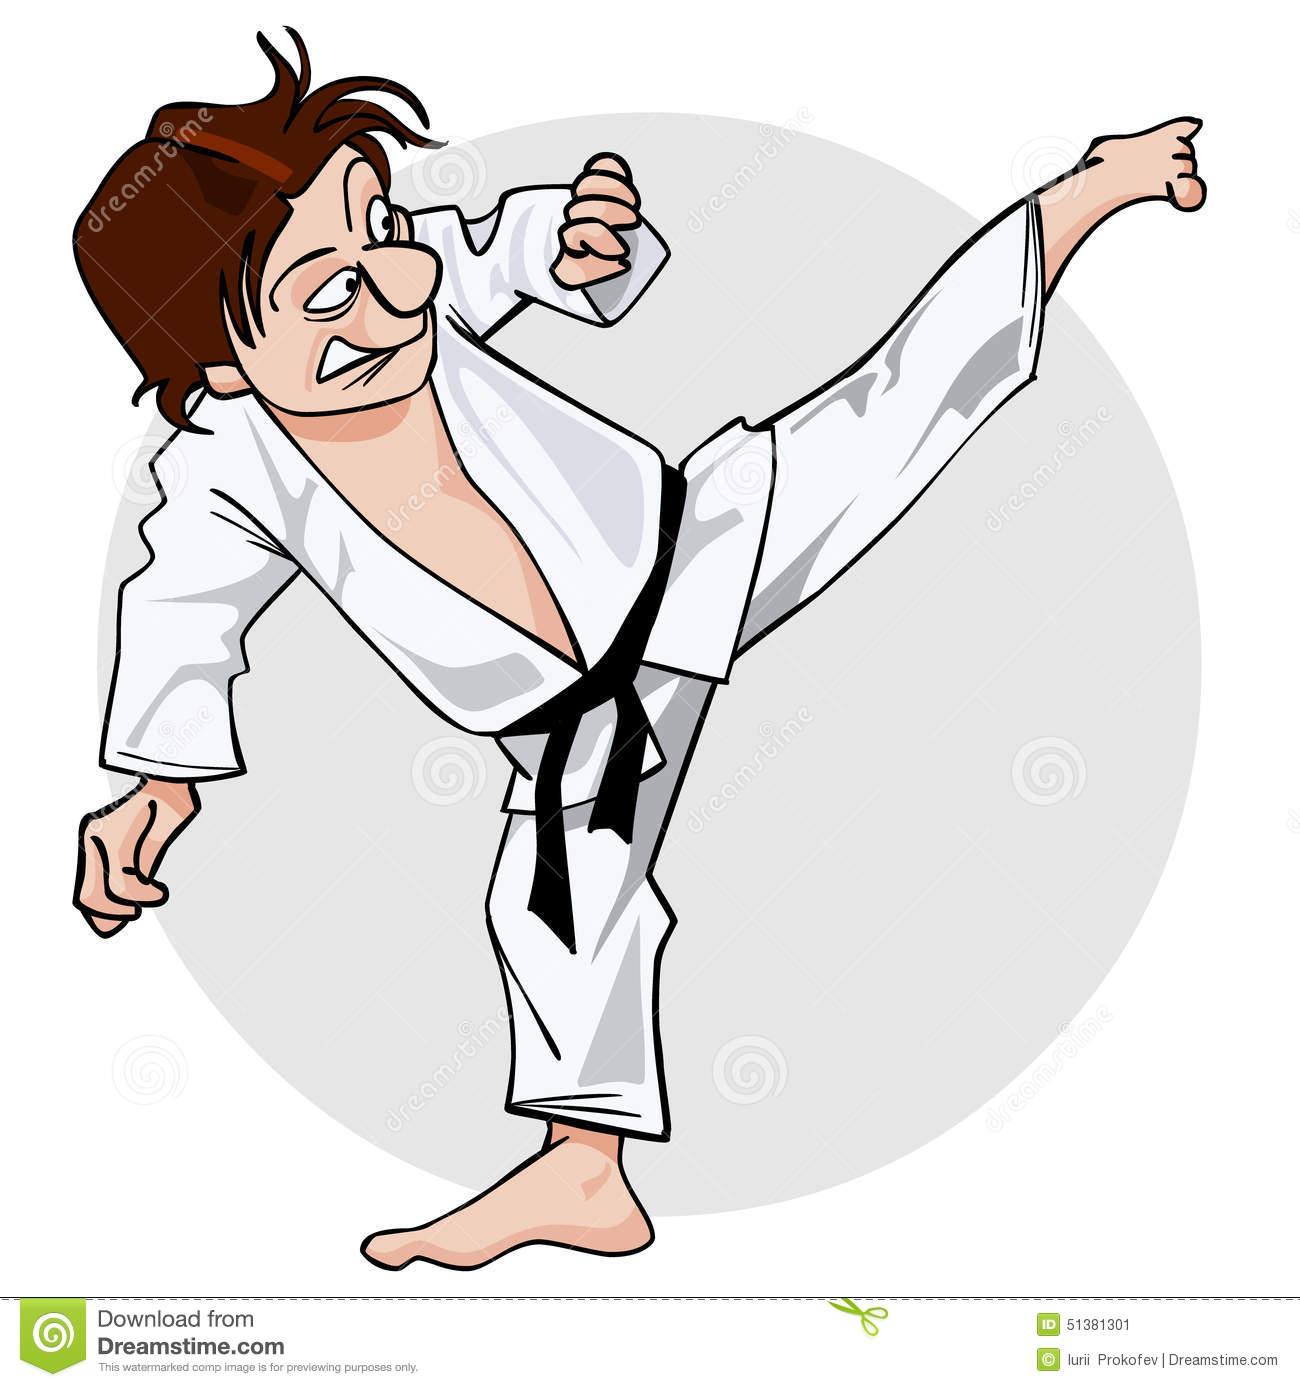 Cartoon Man In A Kimono With A Black Belt In Kicking Pose Yoko.